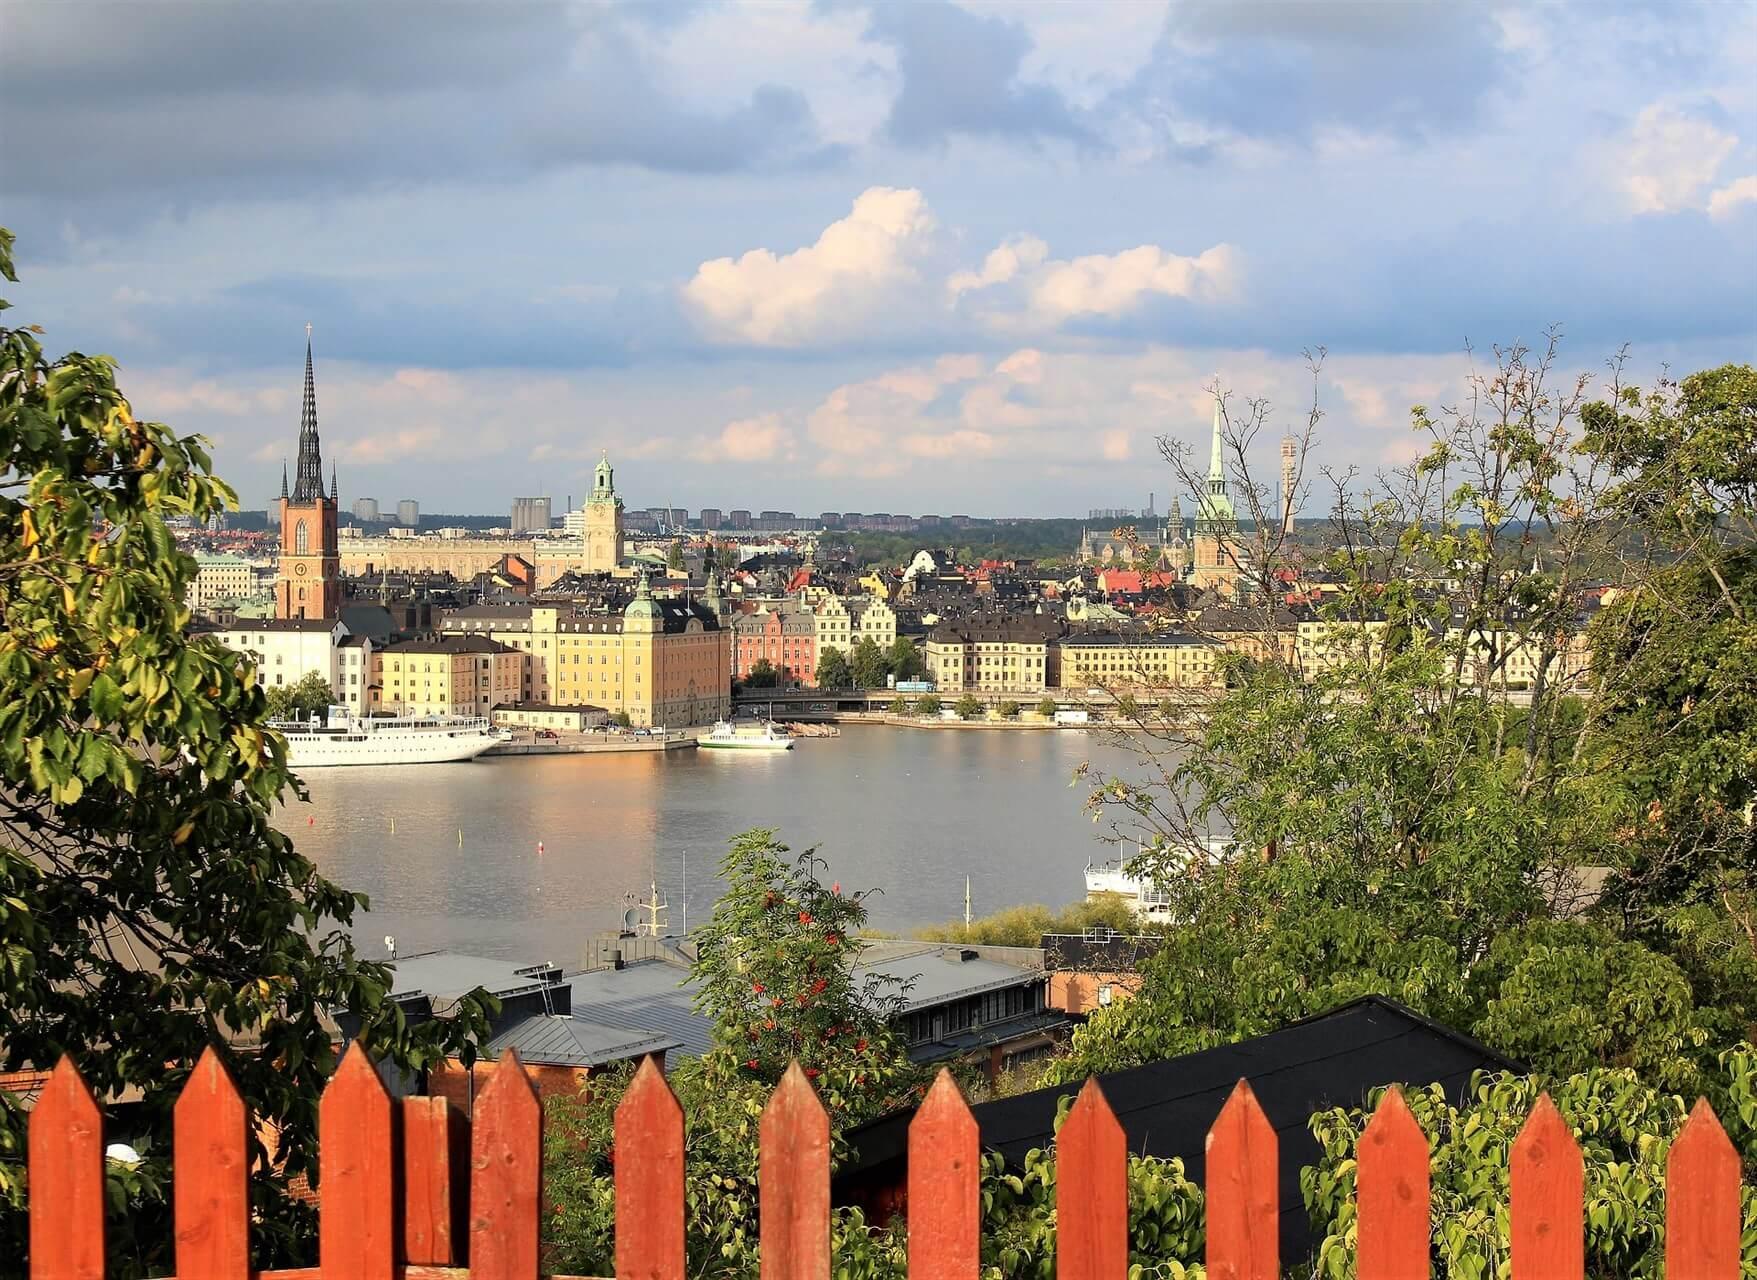 tur v latviju jurmala 22 749 rub chel - Тур в Латвию Юрмала 22 749 руб. чел.